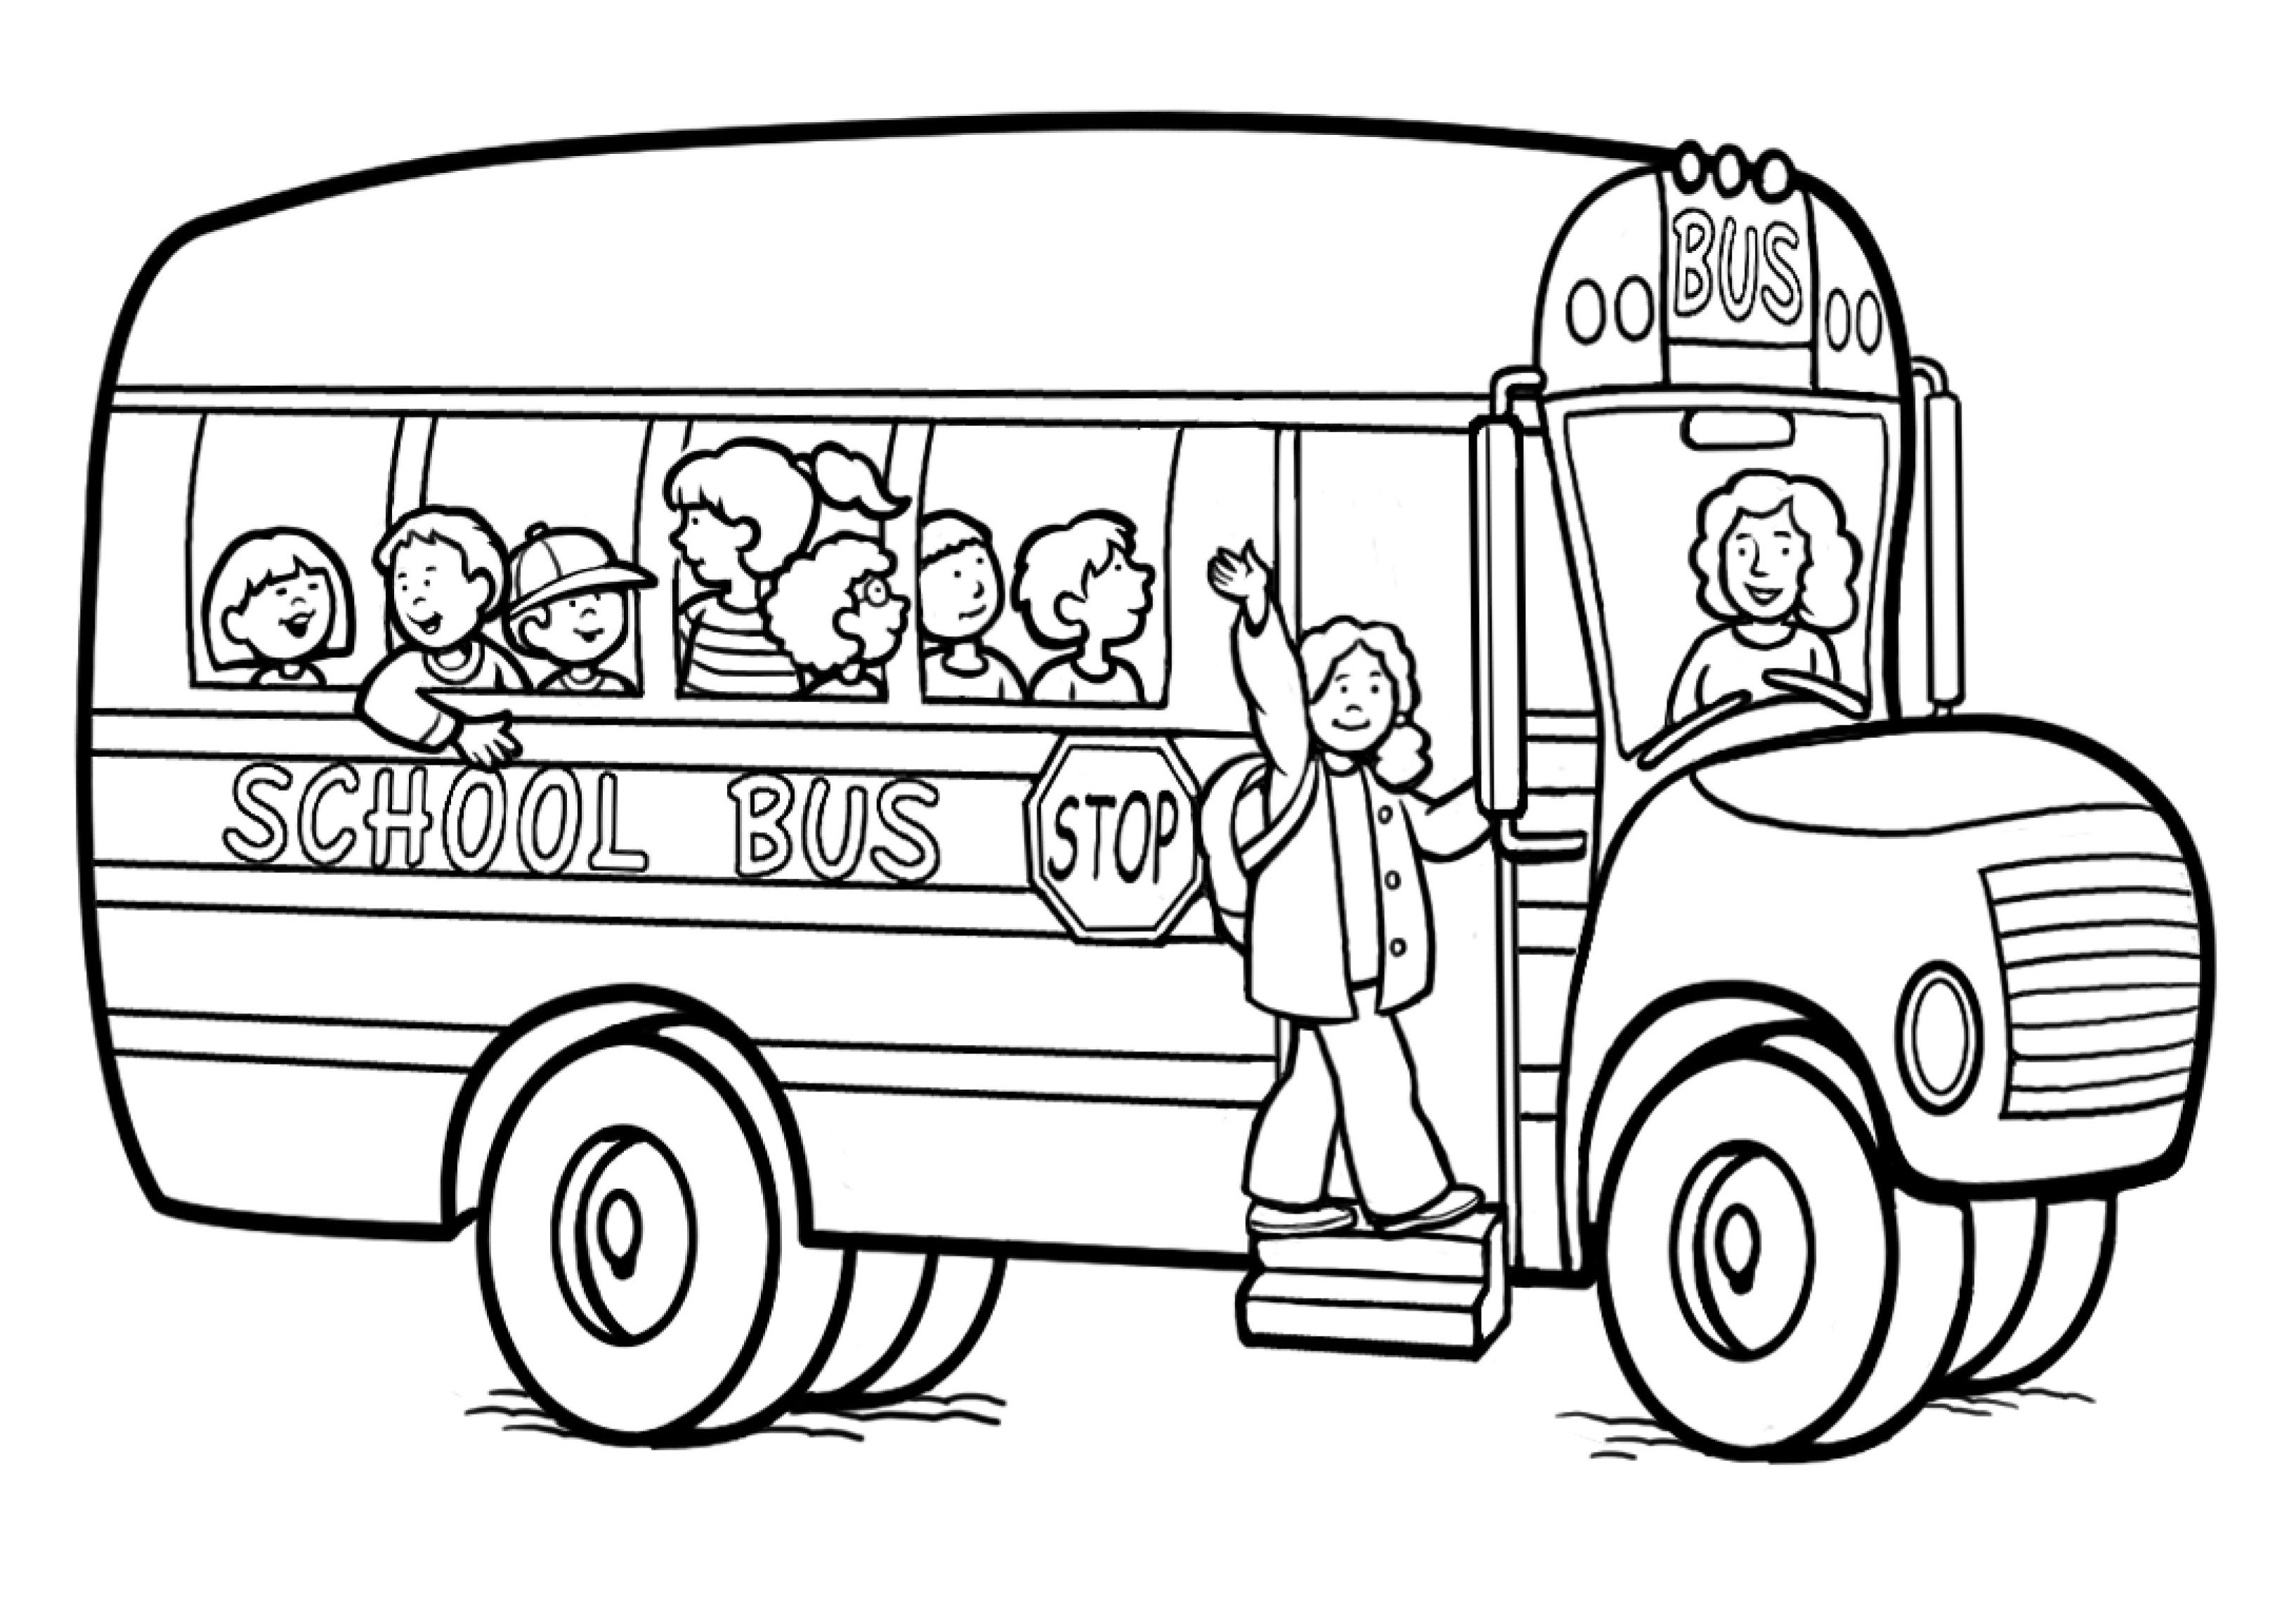 School Bus Coloring Page | MATH TEACHING IDEAS | Pinterest